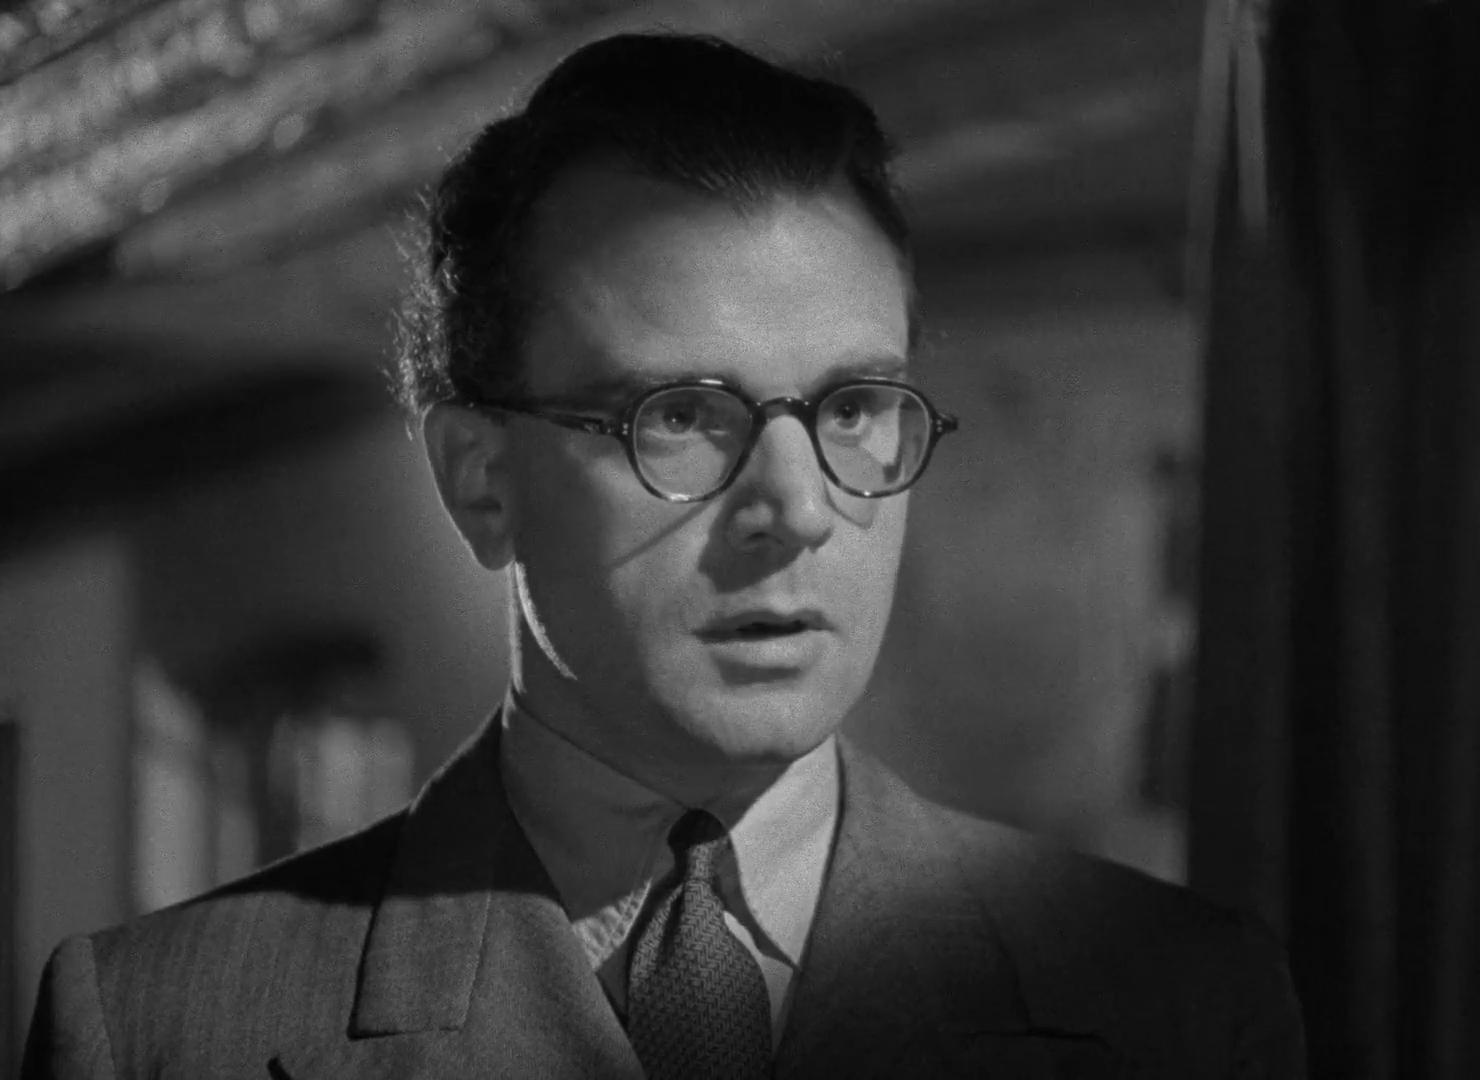 Esmond Knight dans The halfway house (L'auberge fantôme, 1944) de Basil Dearden